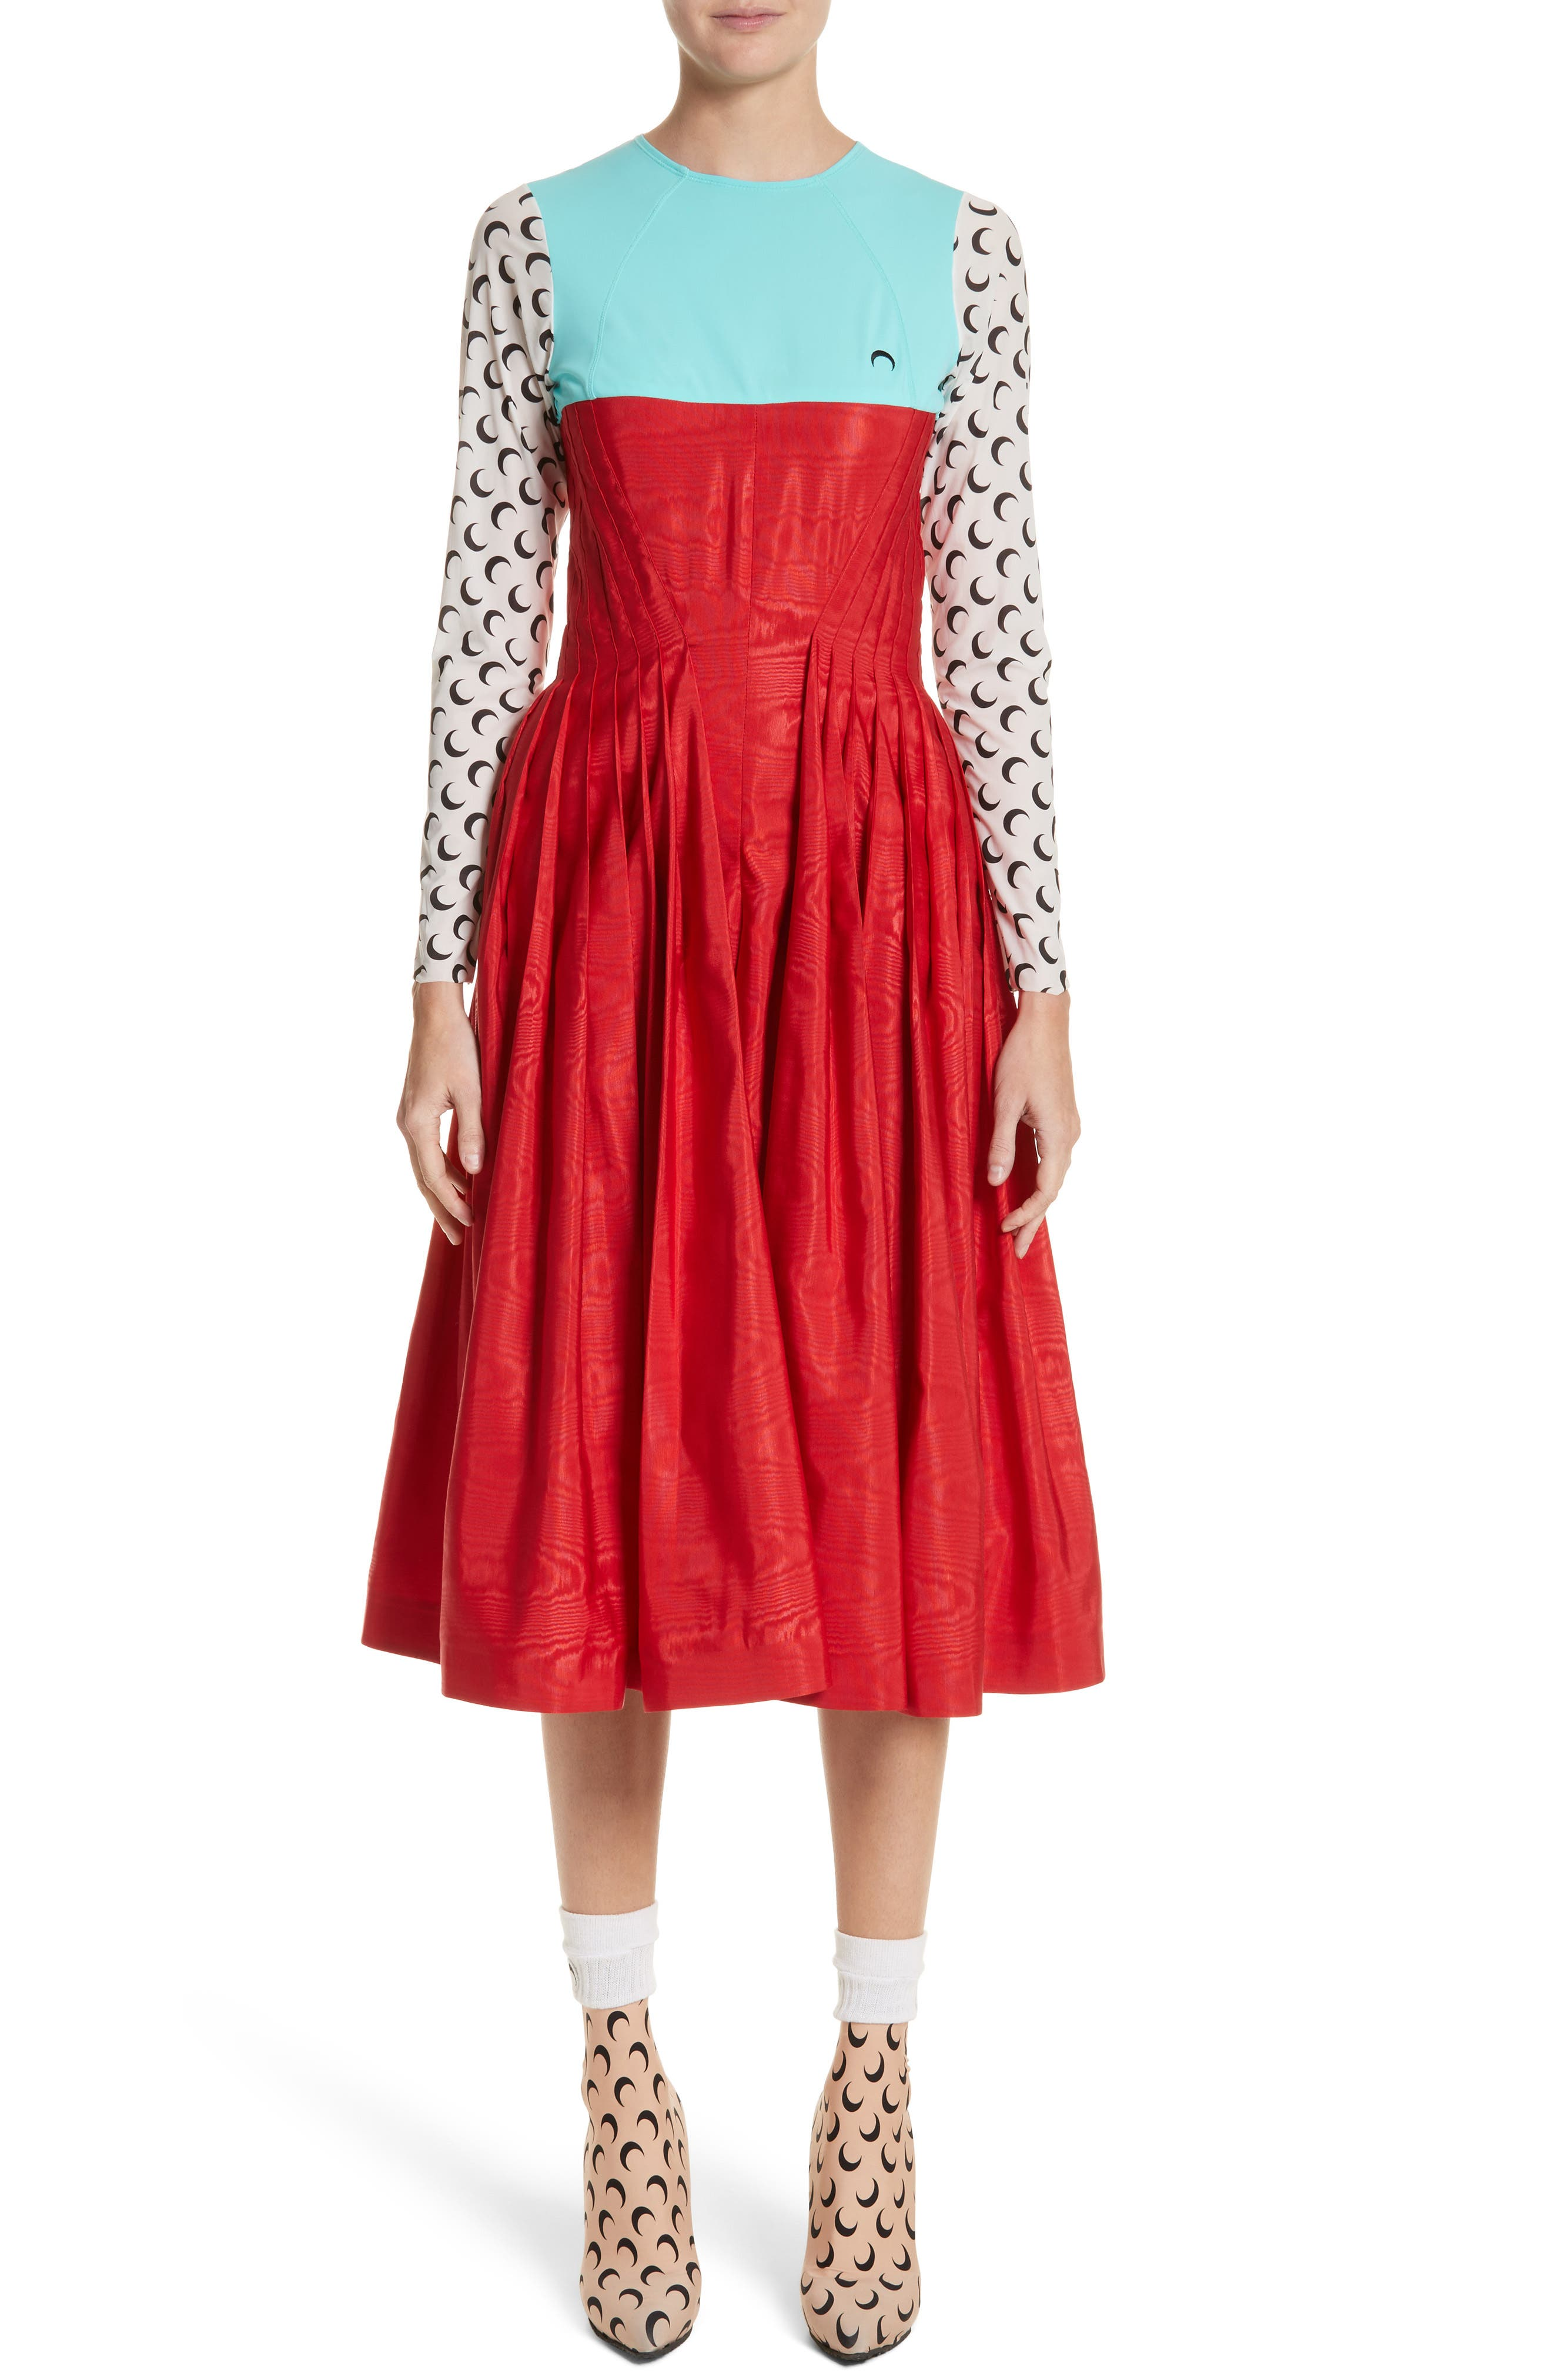 Hybrid Moiré Dress,                             Main thumbnail 1, color,                             600